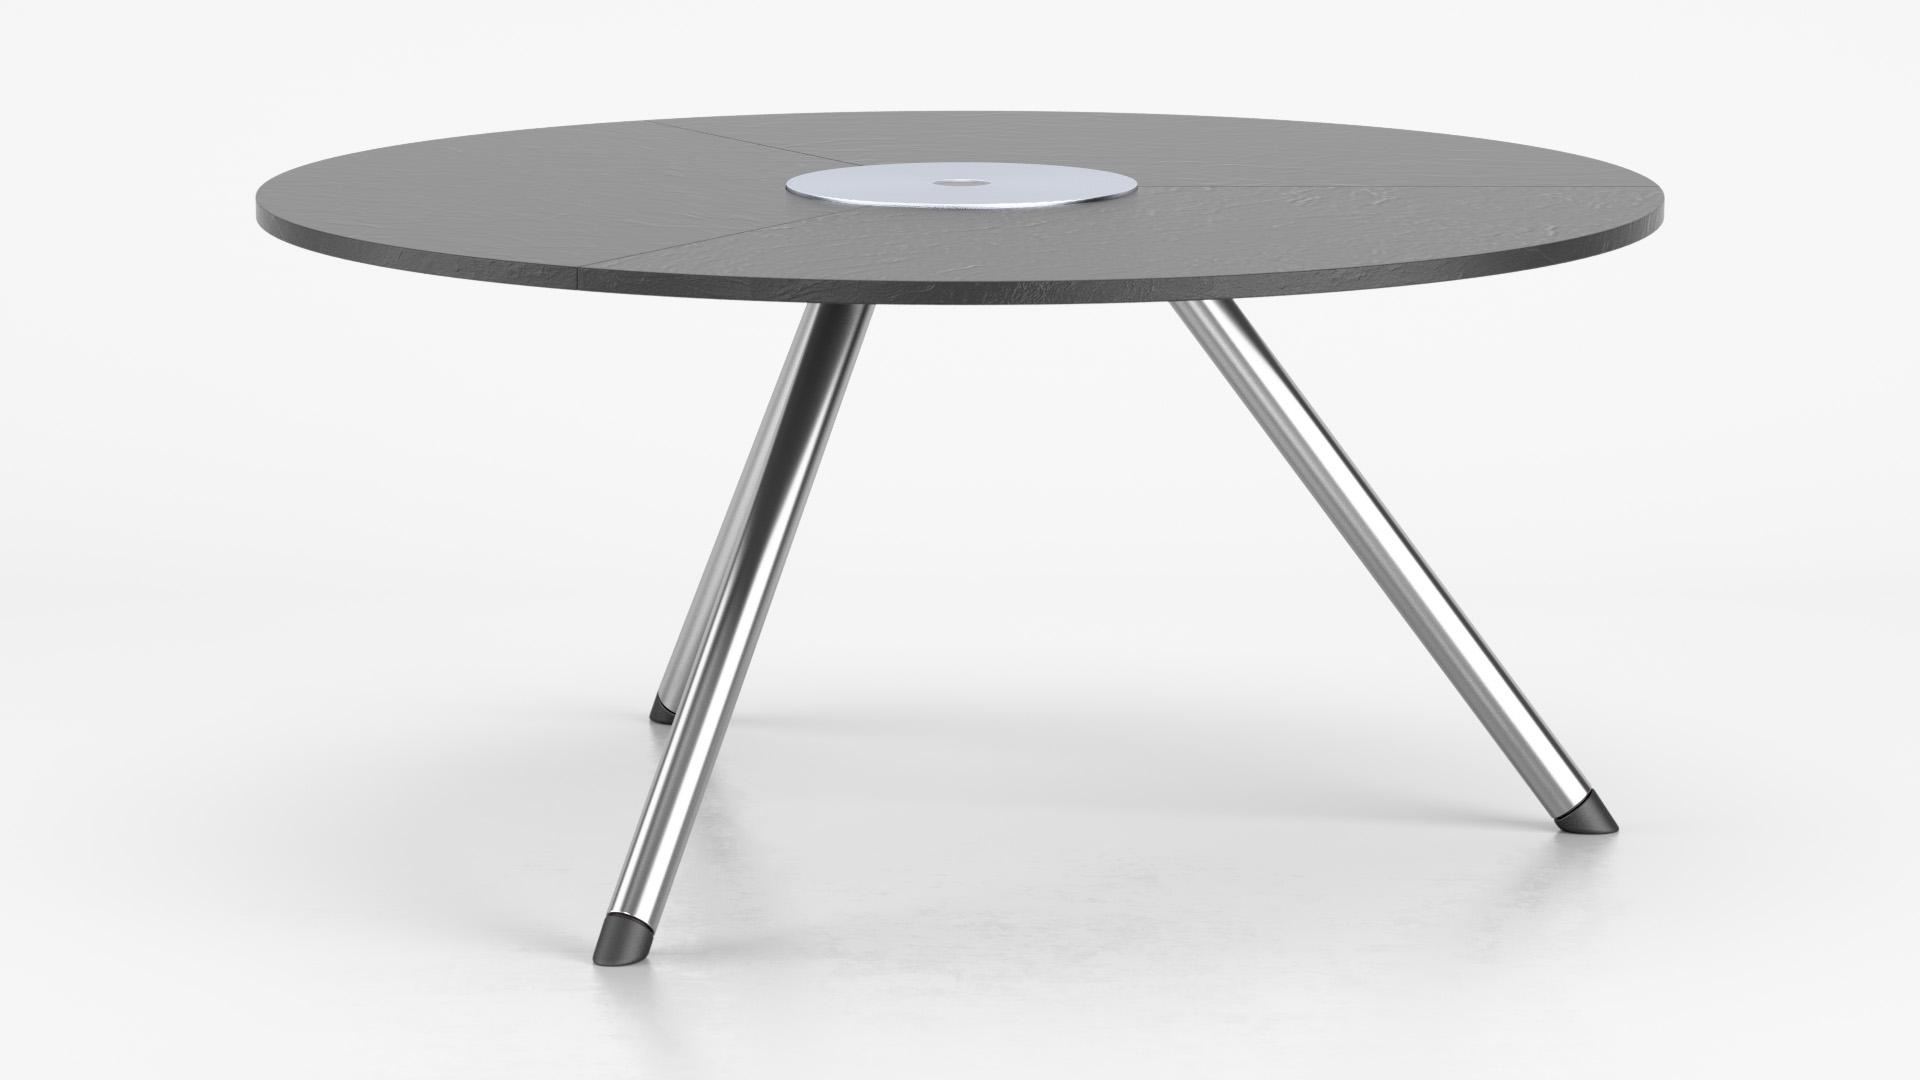 Zenith_Table_WhiteSet_01_0002. Zenith_Table_WhiteSet_01_0003.  Zenith_Table_WhiteSet_01_0004. Zenith_Table_WhiteSet_01_wire_0001